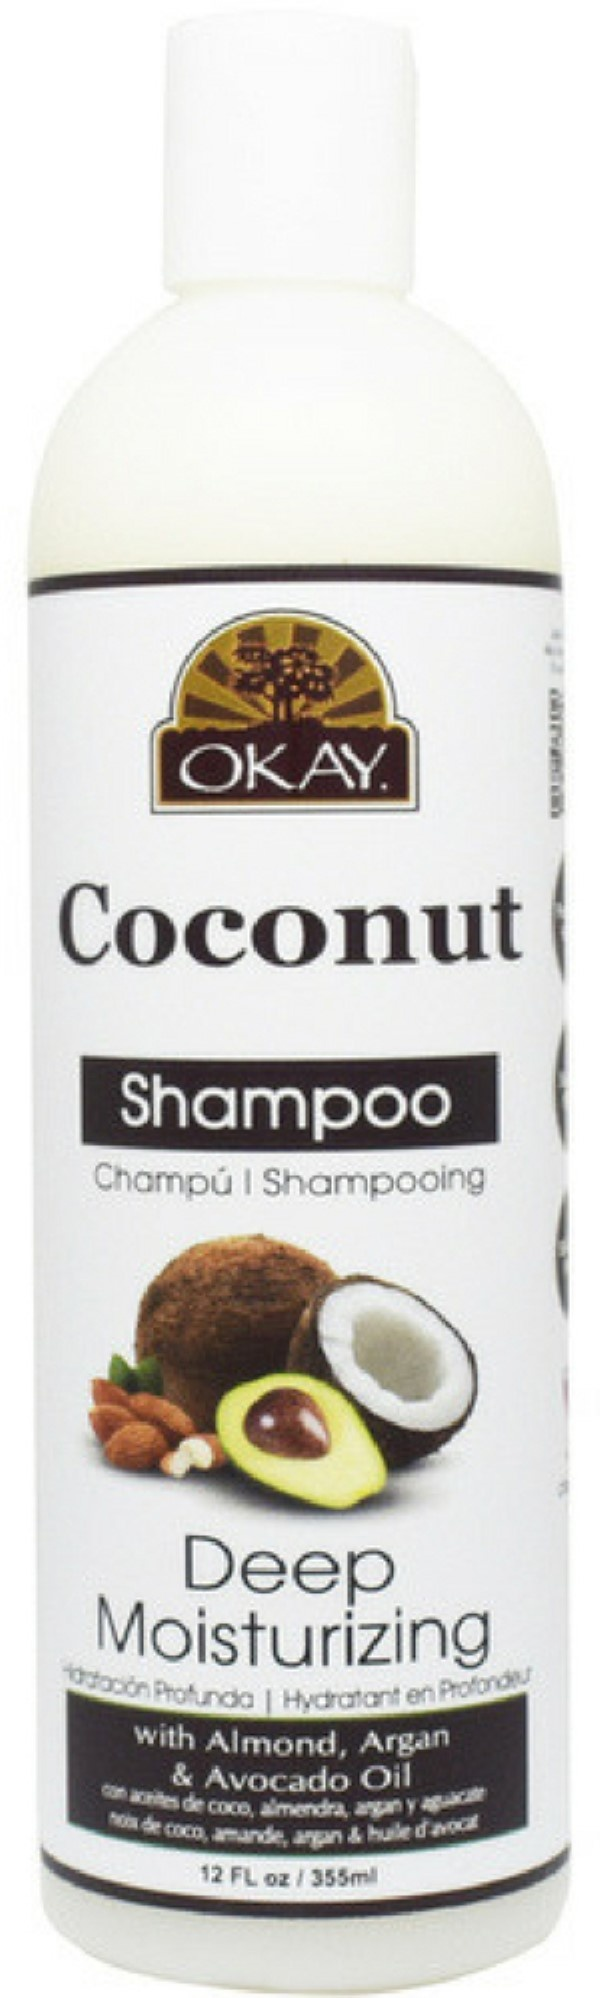 pure coconut shampoo beauty buy online from fishpond com hk